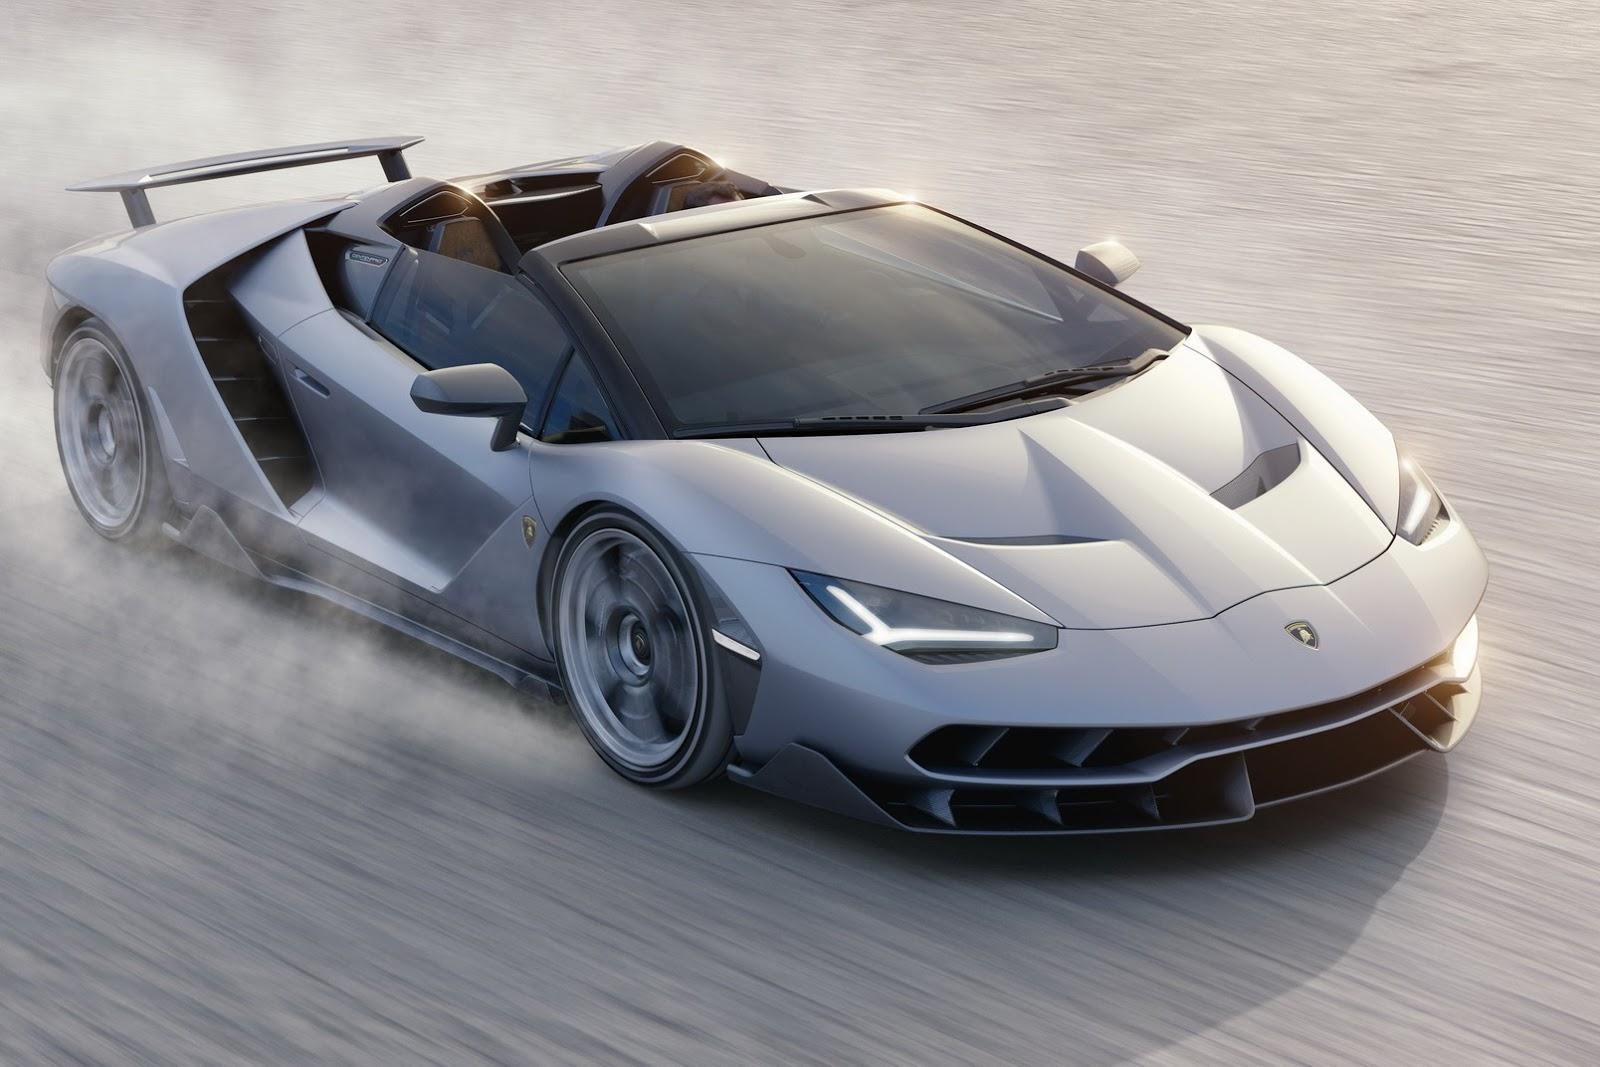 Lamborghini Valkyrie rival hypercar